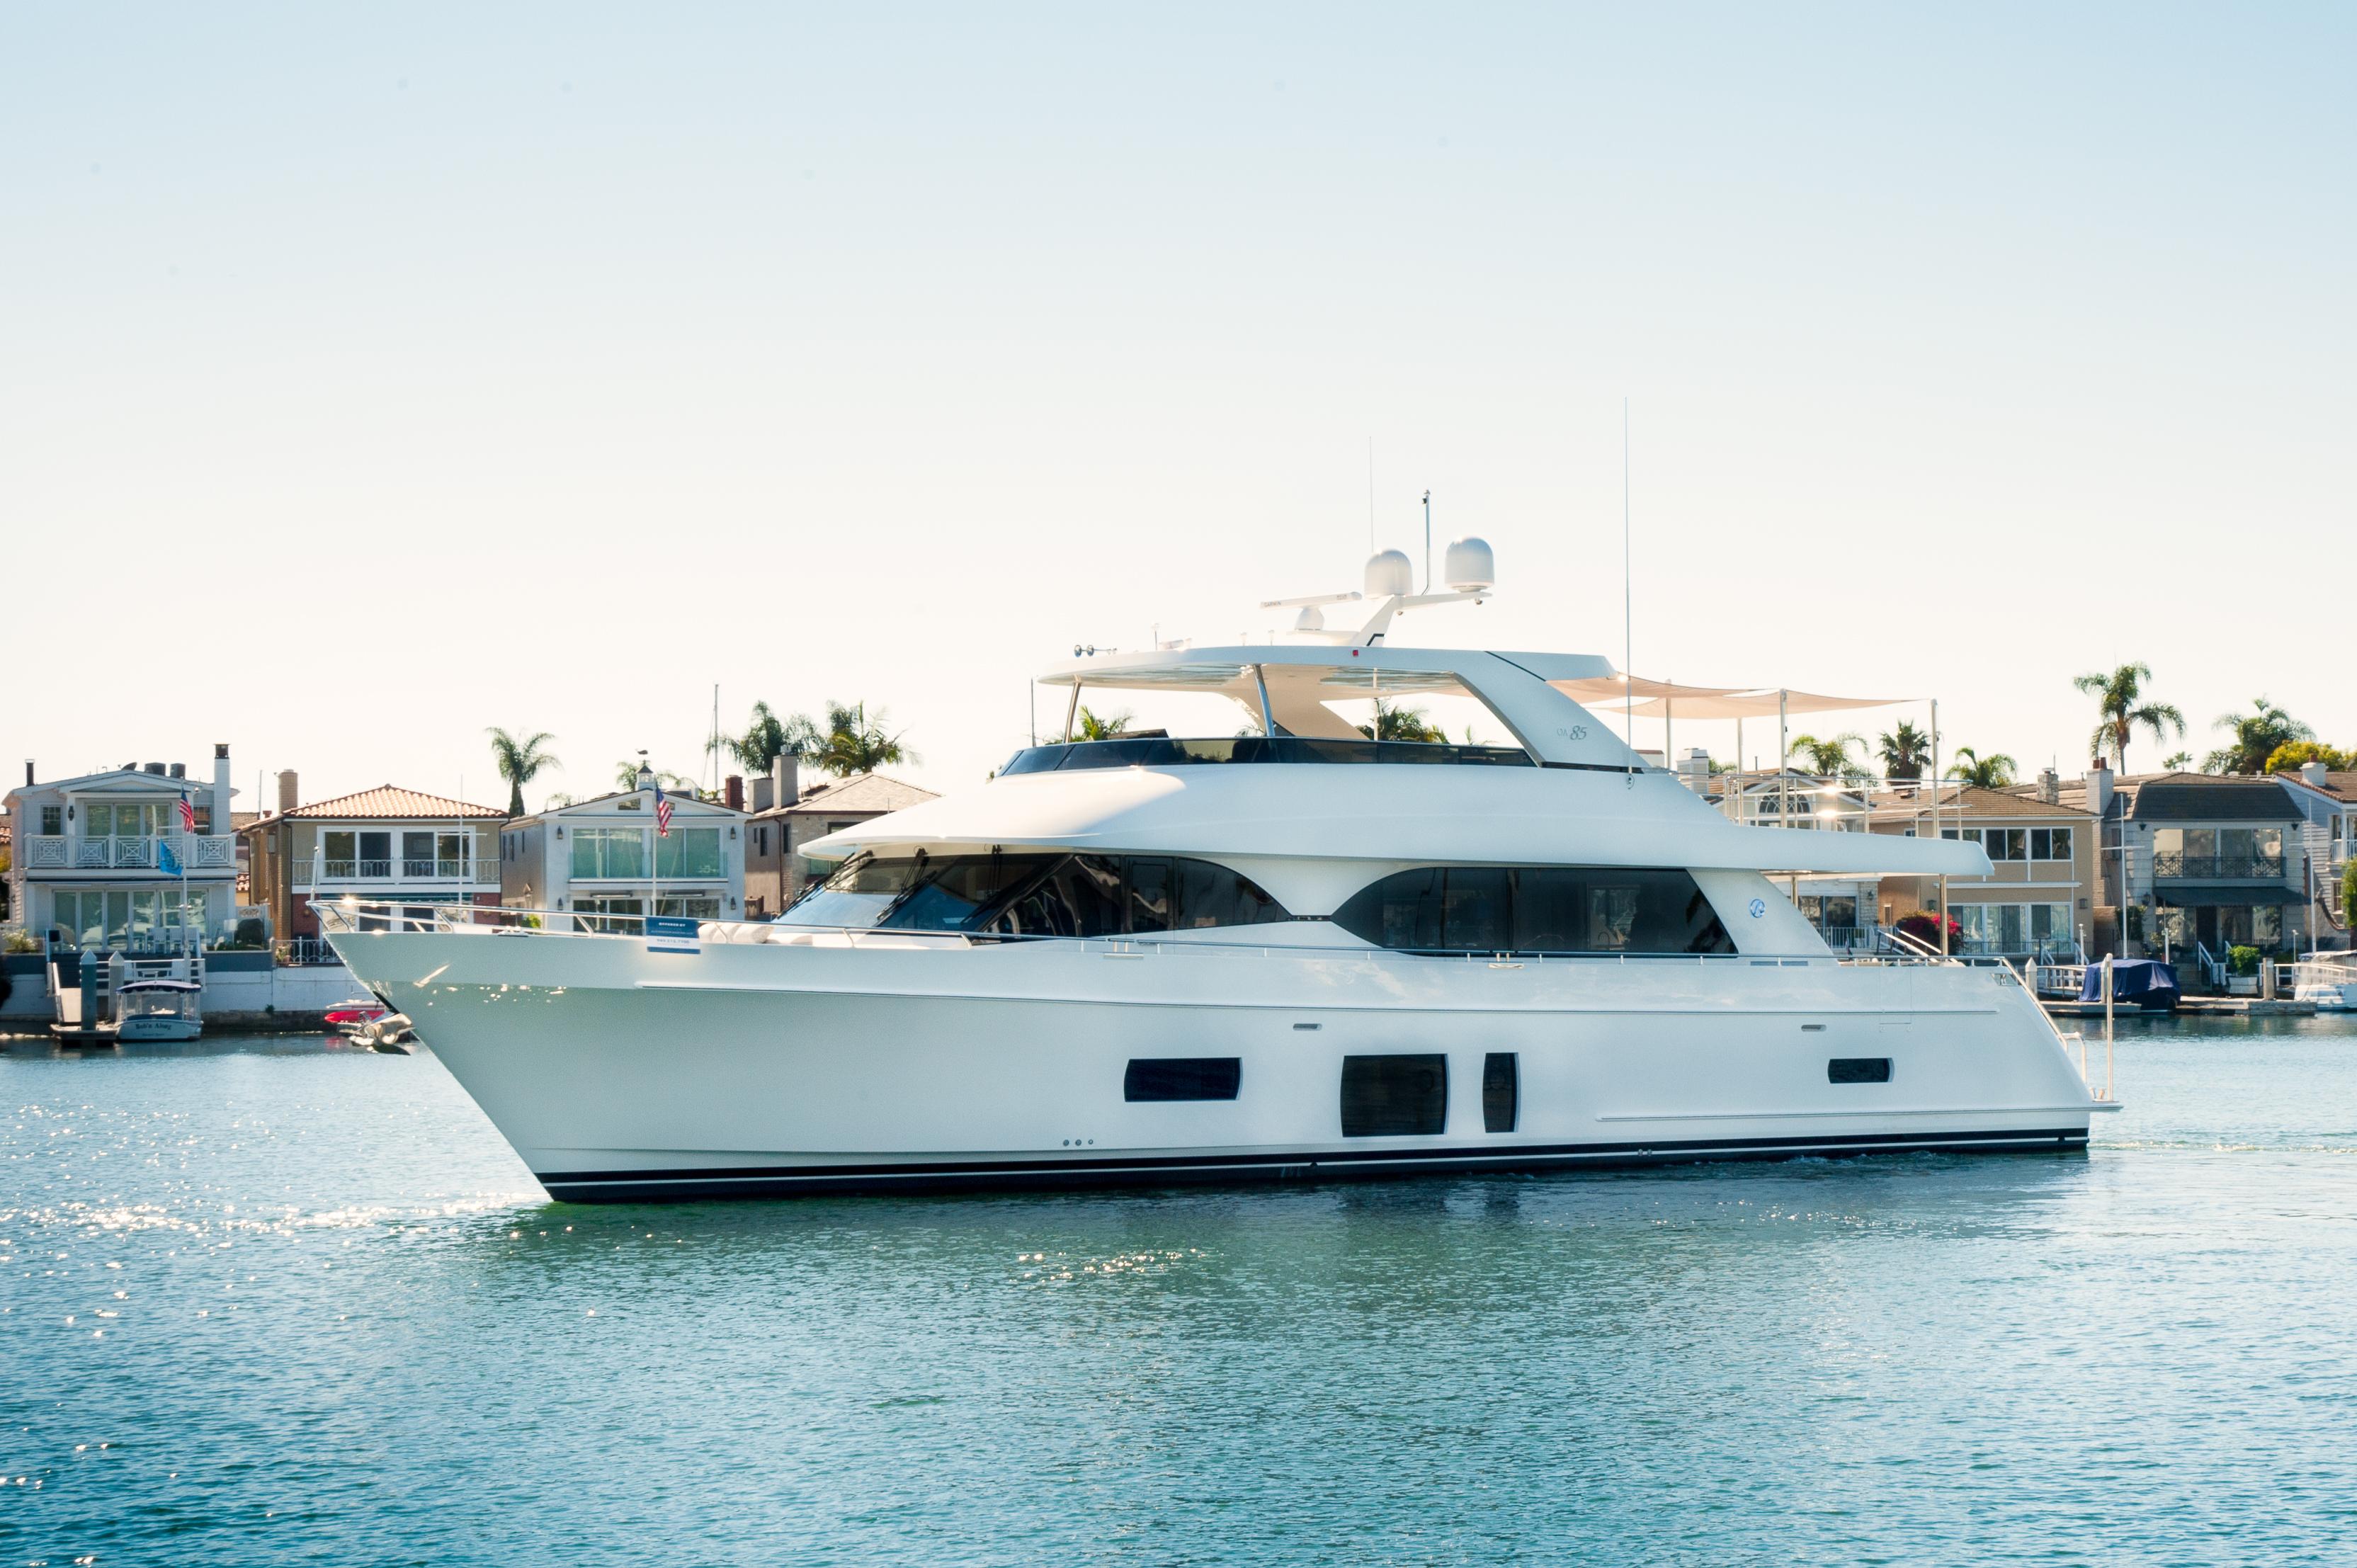 women nike air max 2018 yellowfin boats sportfishing yachts sales